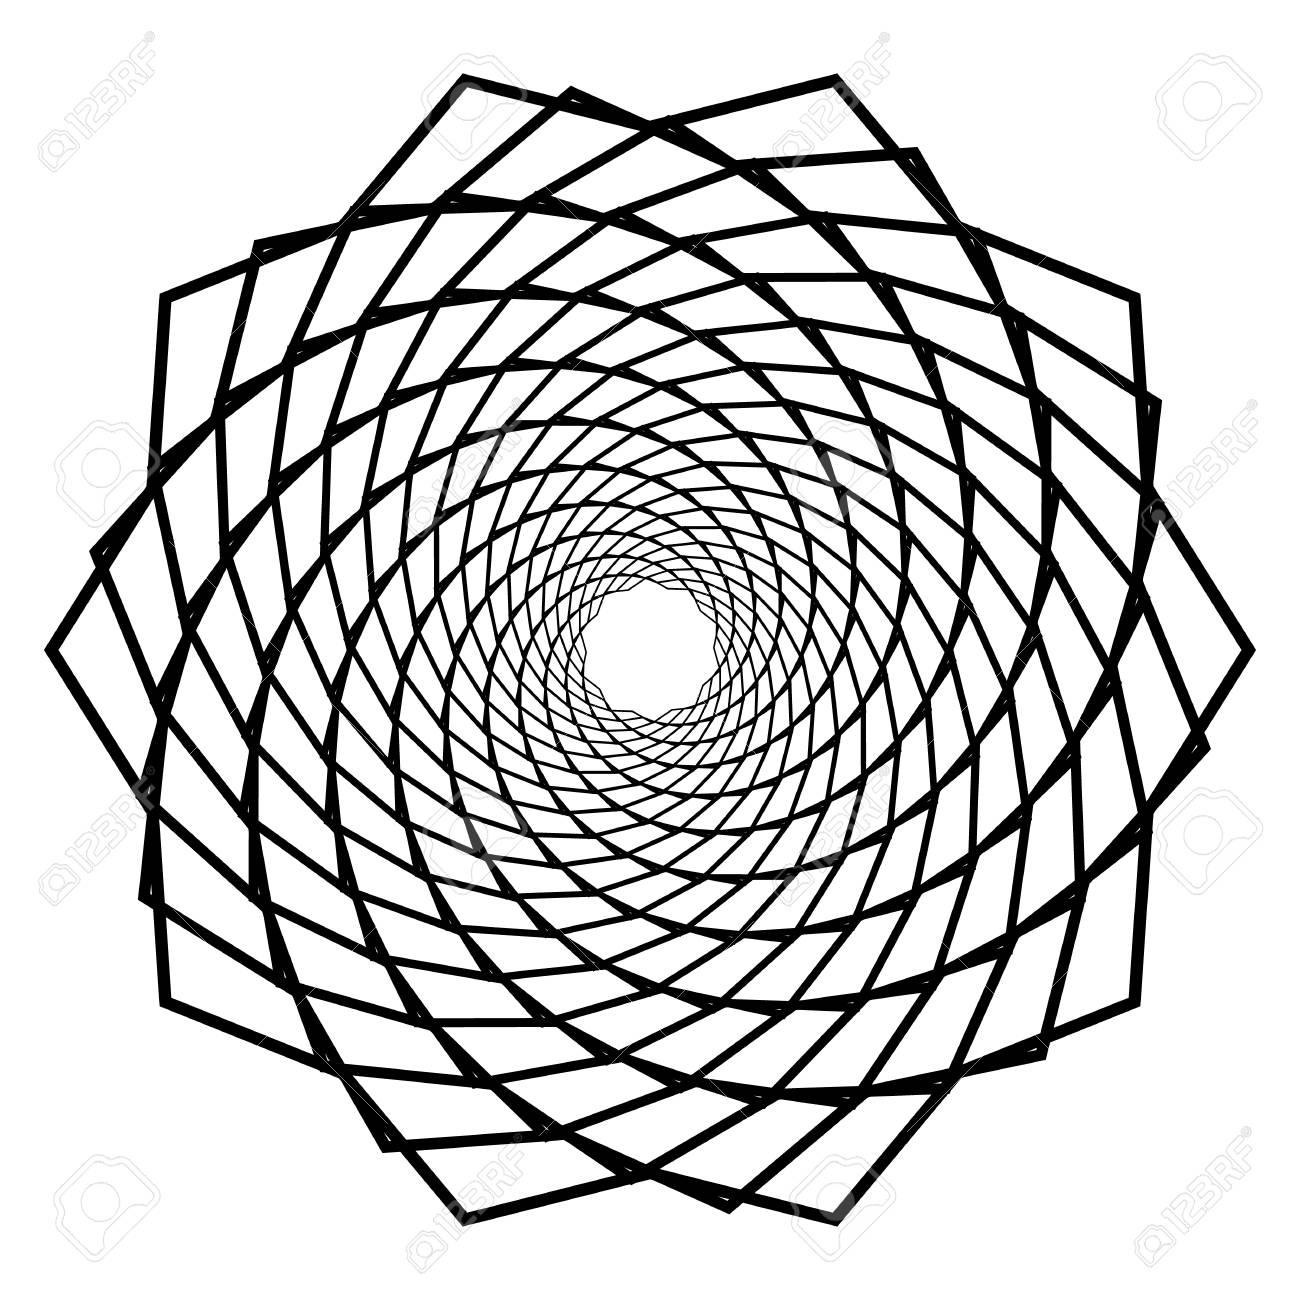 Mandala, motif with wavy, zig-zag lines rotating Vector illustration